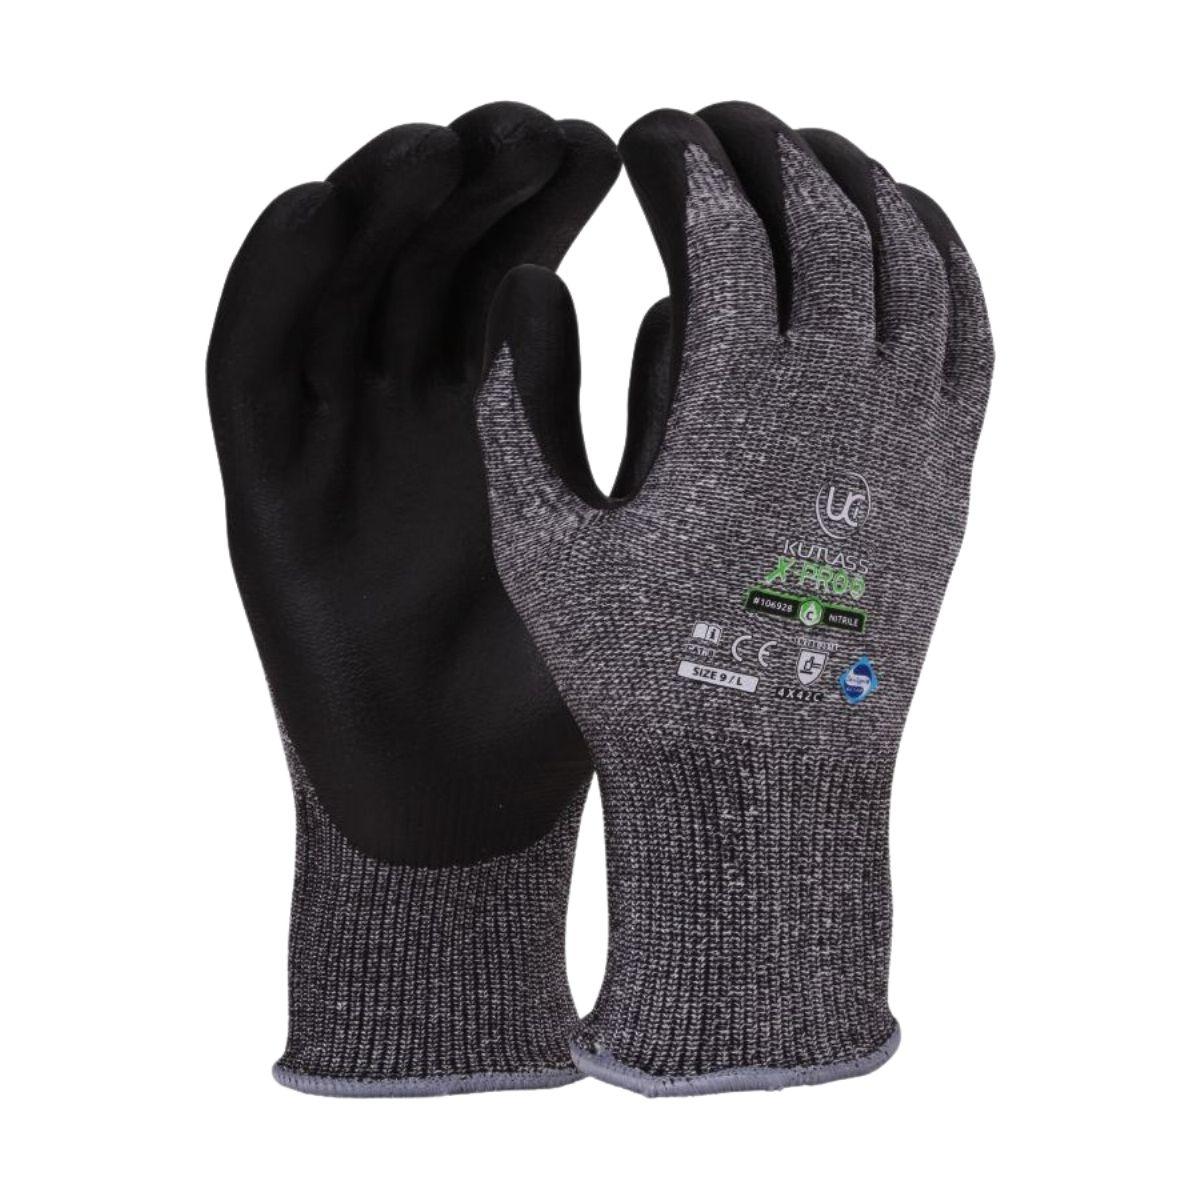 GL3142 Kutlass Cut Level 5 Nitrile Coated Gloves